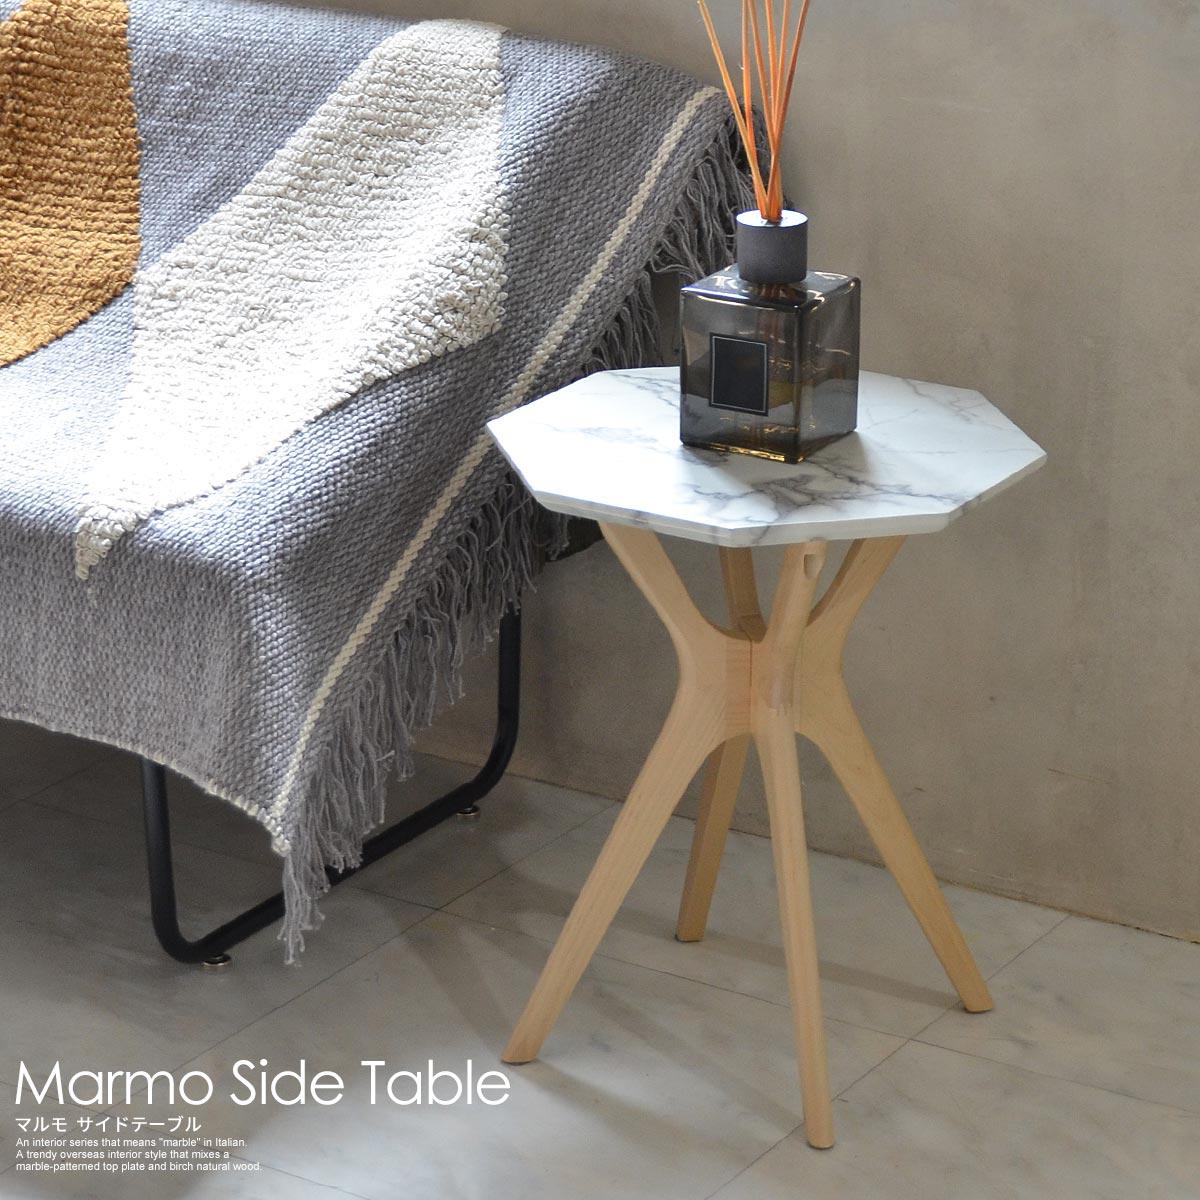 MARMO(マルモ) サイドテーブル ホワイト 八角形